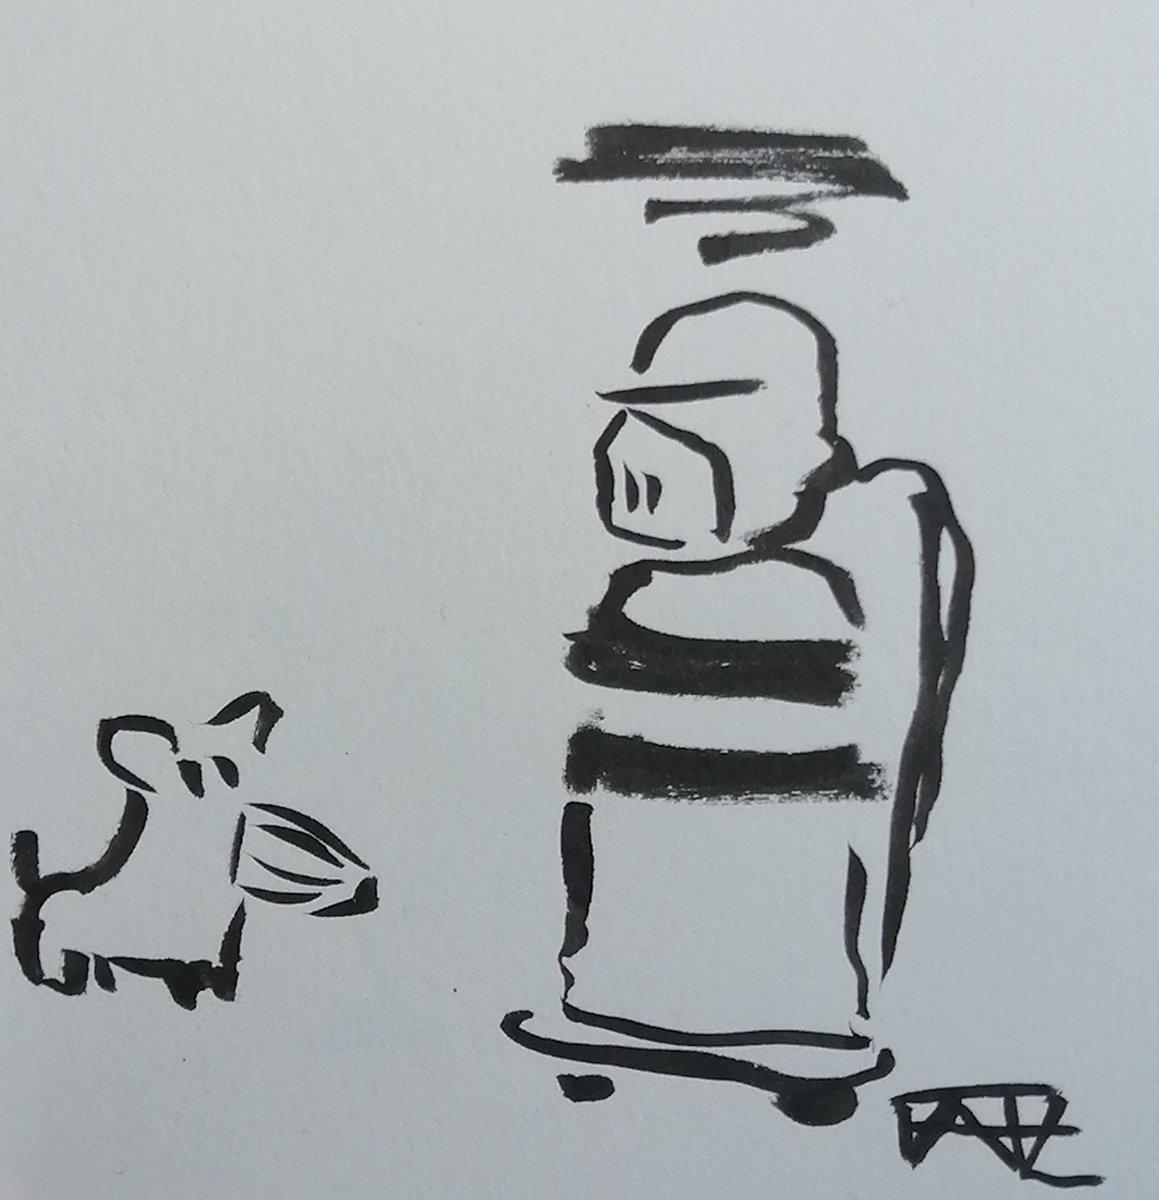 Hast du auch Tollwut?  @kritzelich #DenkanstoßDonnerstag #LessThan60sChallenge #drawing #doodle #art #sketch #ink #inkdrawing #fanart #horrormovie #Hannibal #grusel #horror #kleineKunstklasse #onedrawingadayforeverpic.twitter.com/8l1eelOzgY